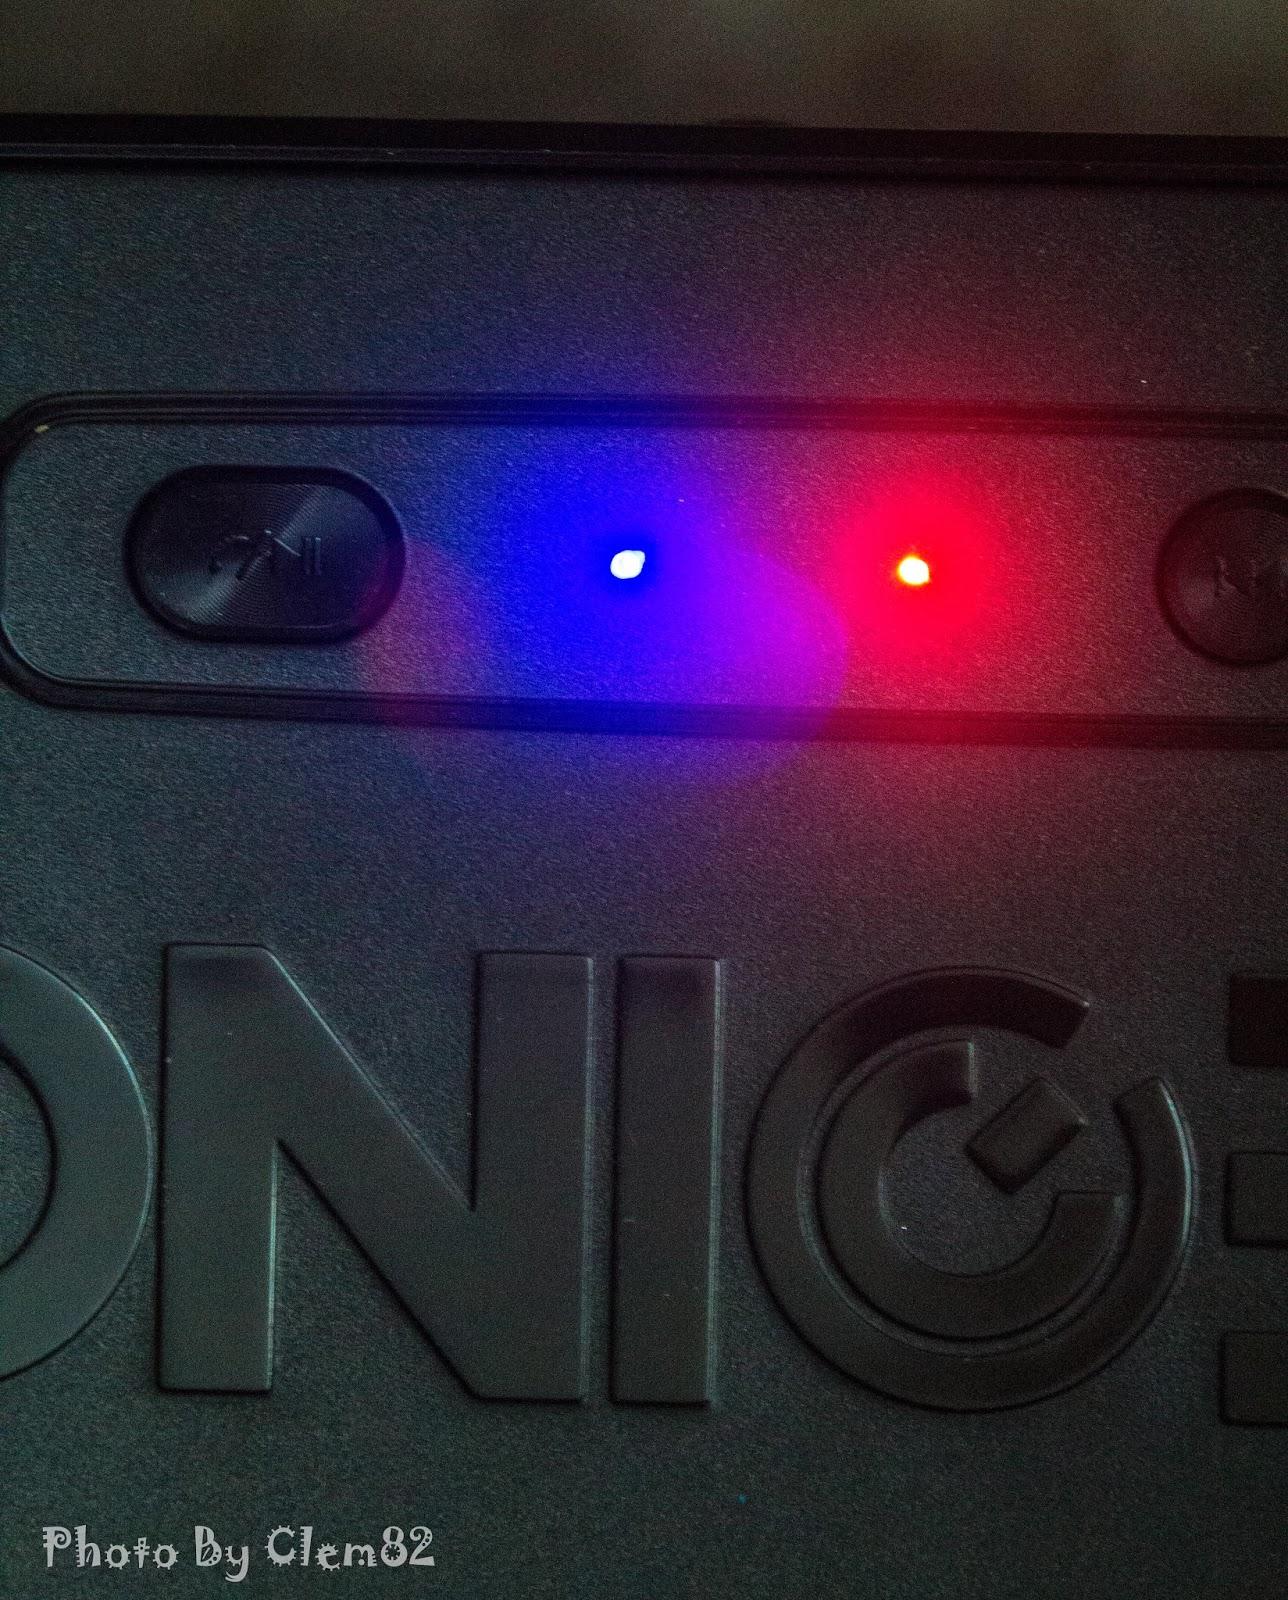 Opening Pandora's Box: SonicGear Pandora Wireless Bluetooth Media Player Series 29